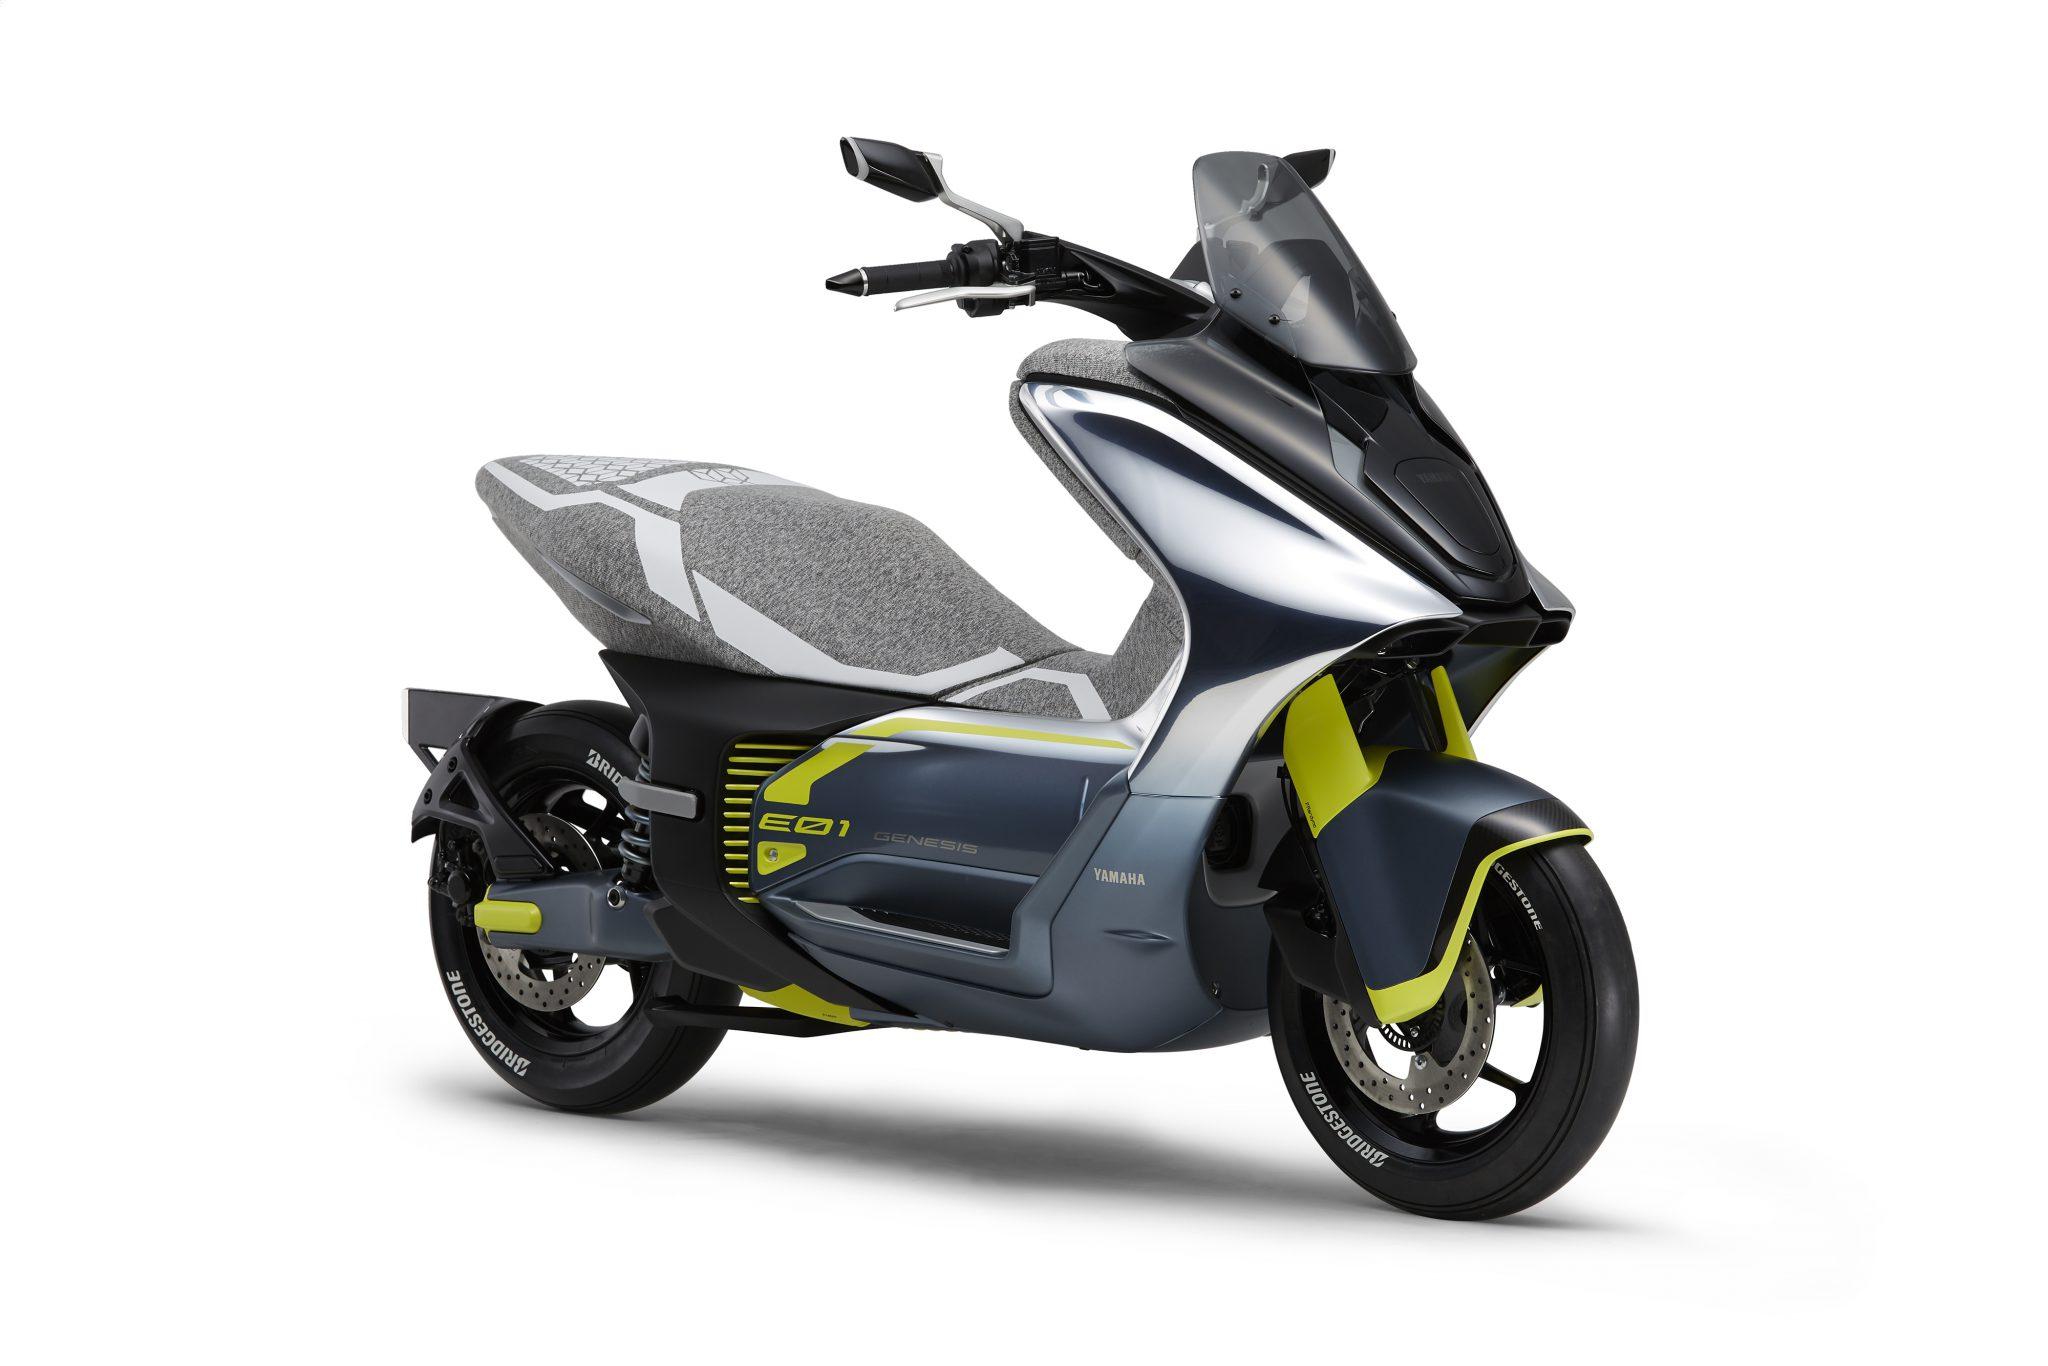 Yamaha Motor deelt concepten tijdens 46e Tokyo Motor Show 2019